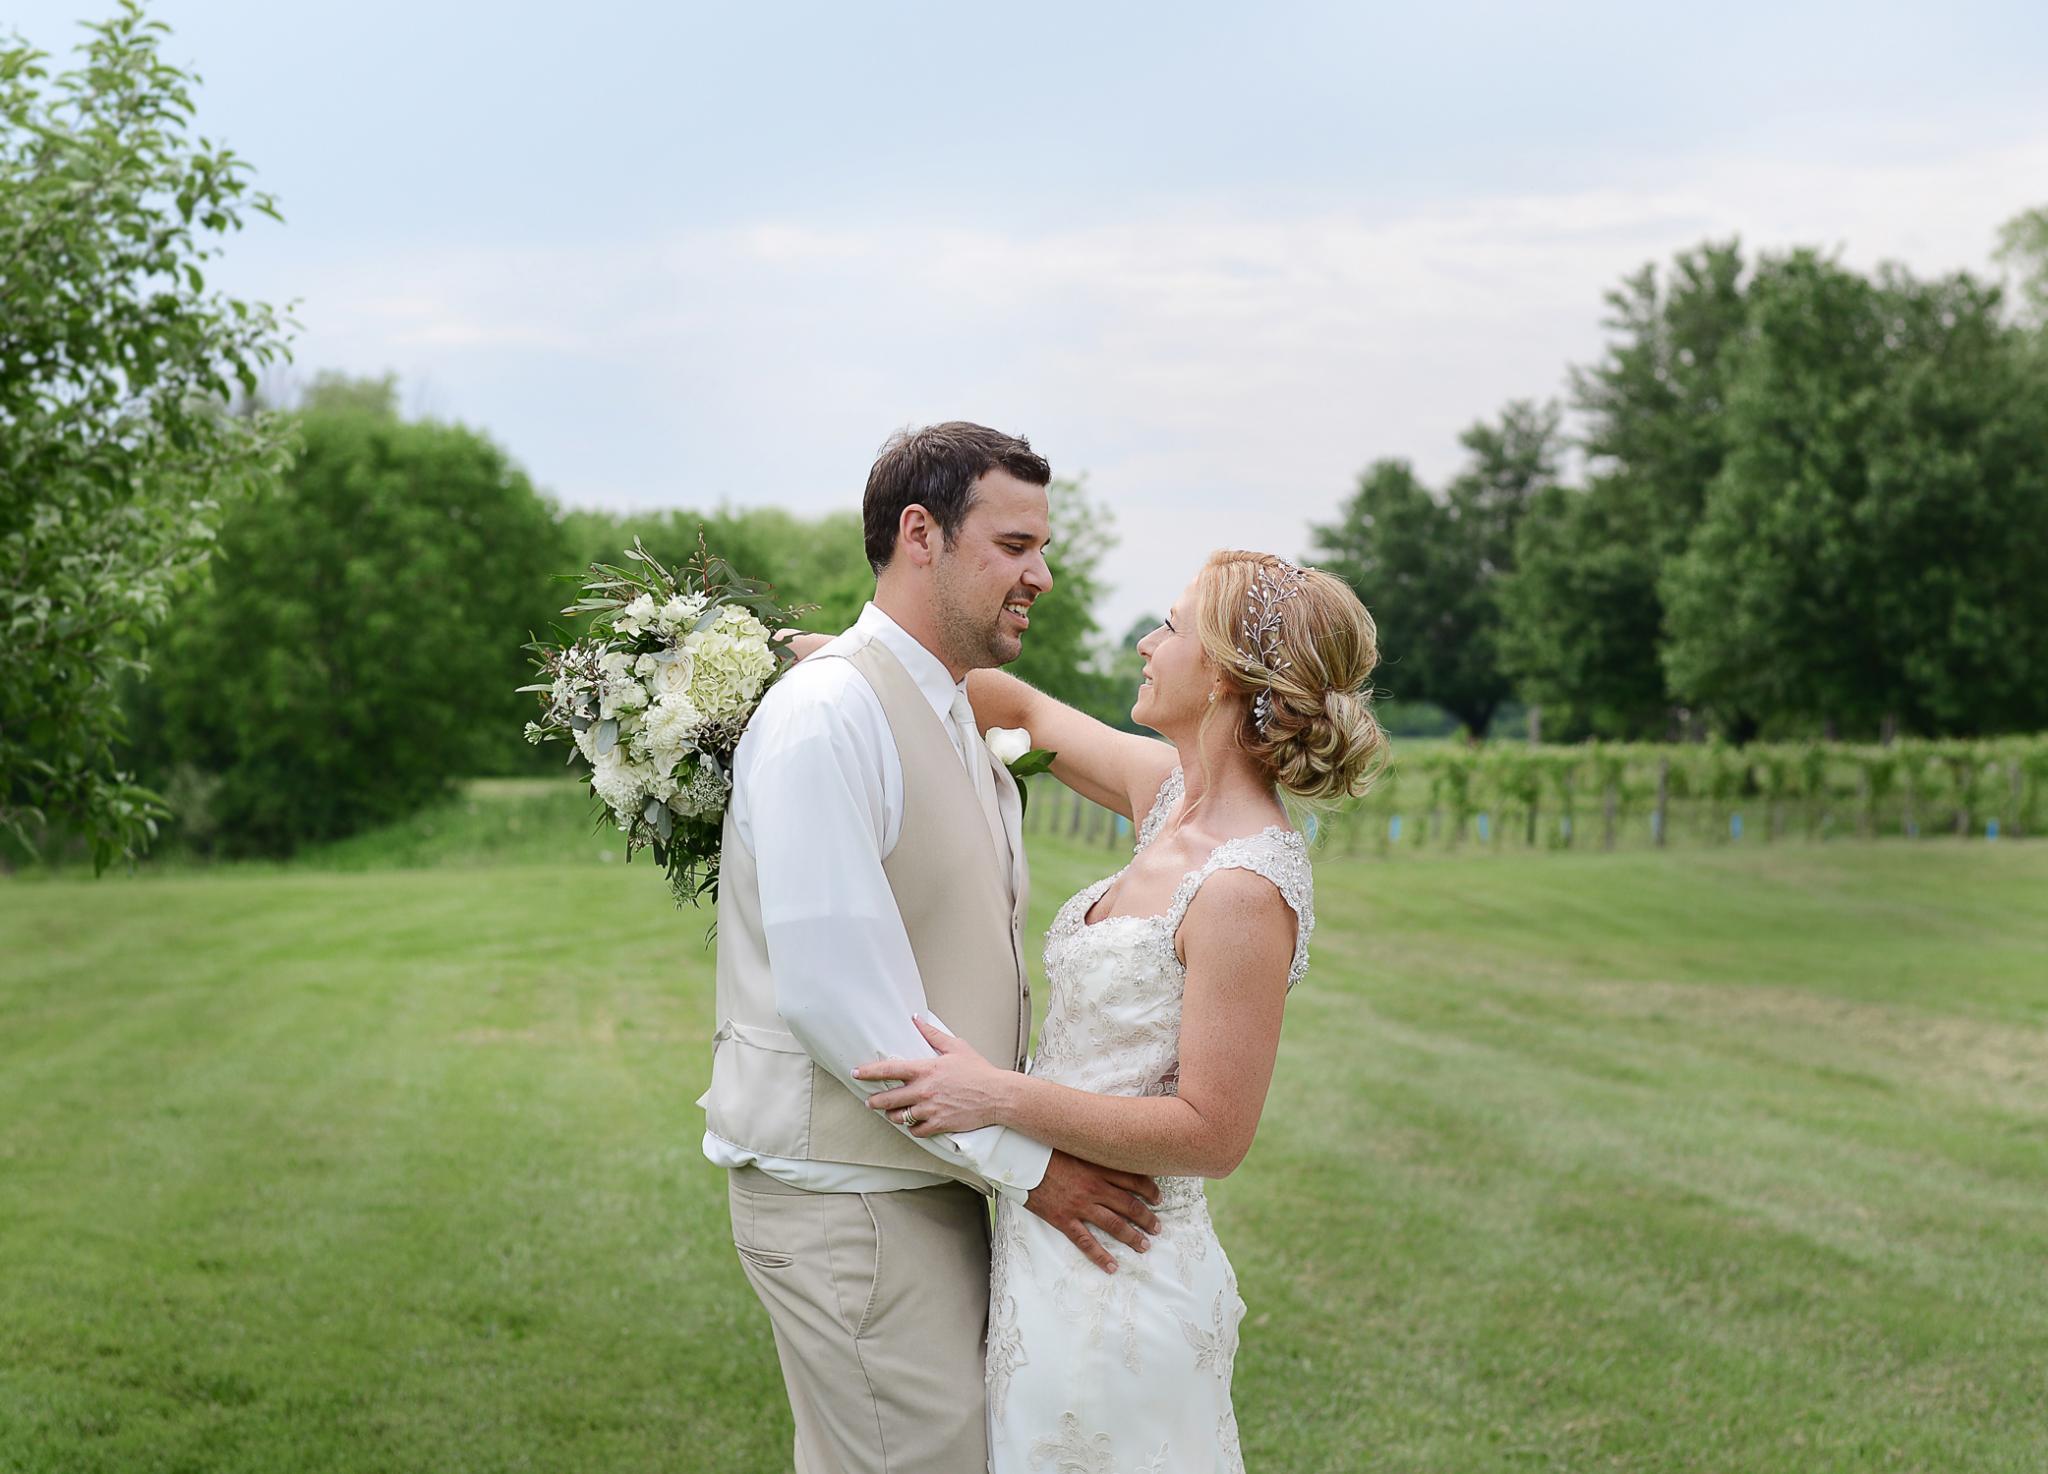 Brittneey & David | Wedding | SNPJ Recreation Center | Youngstown Wedding Photographer